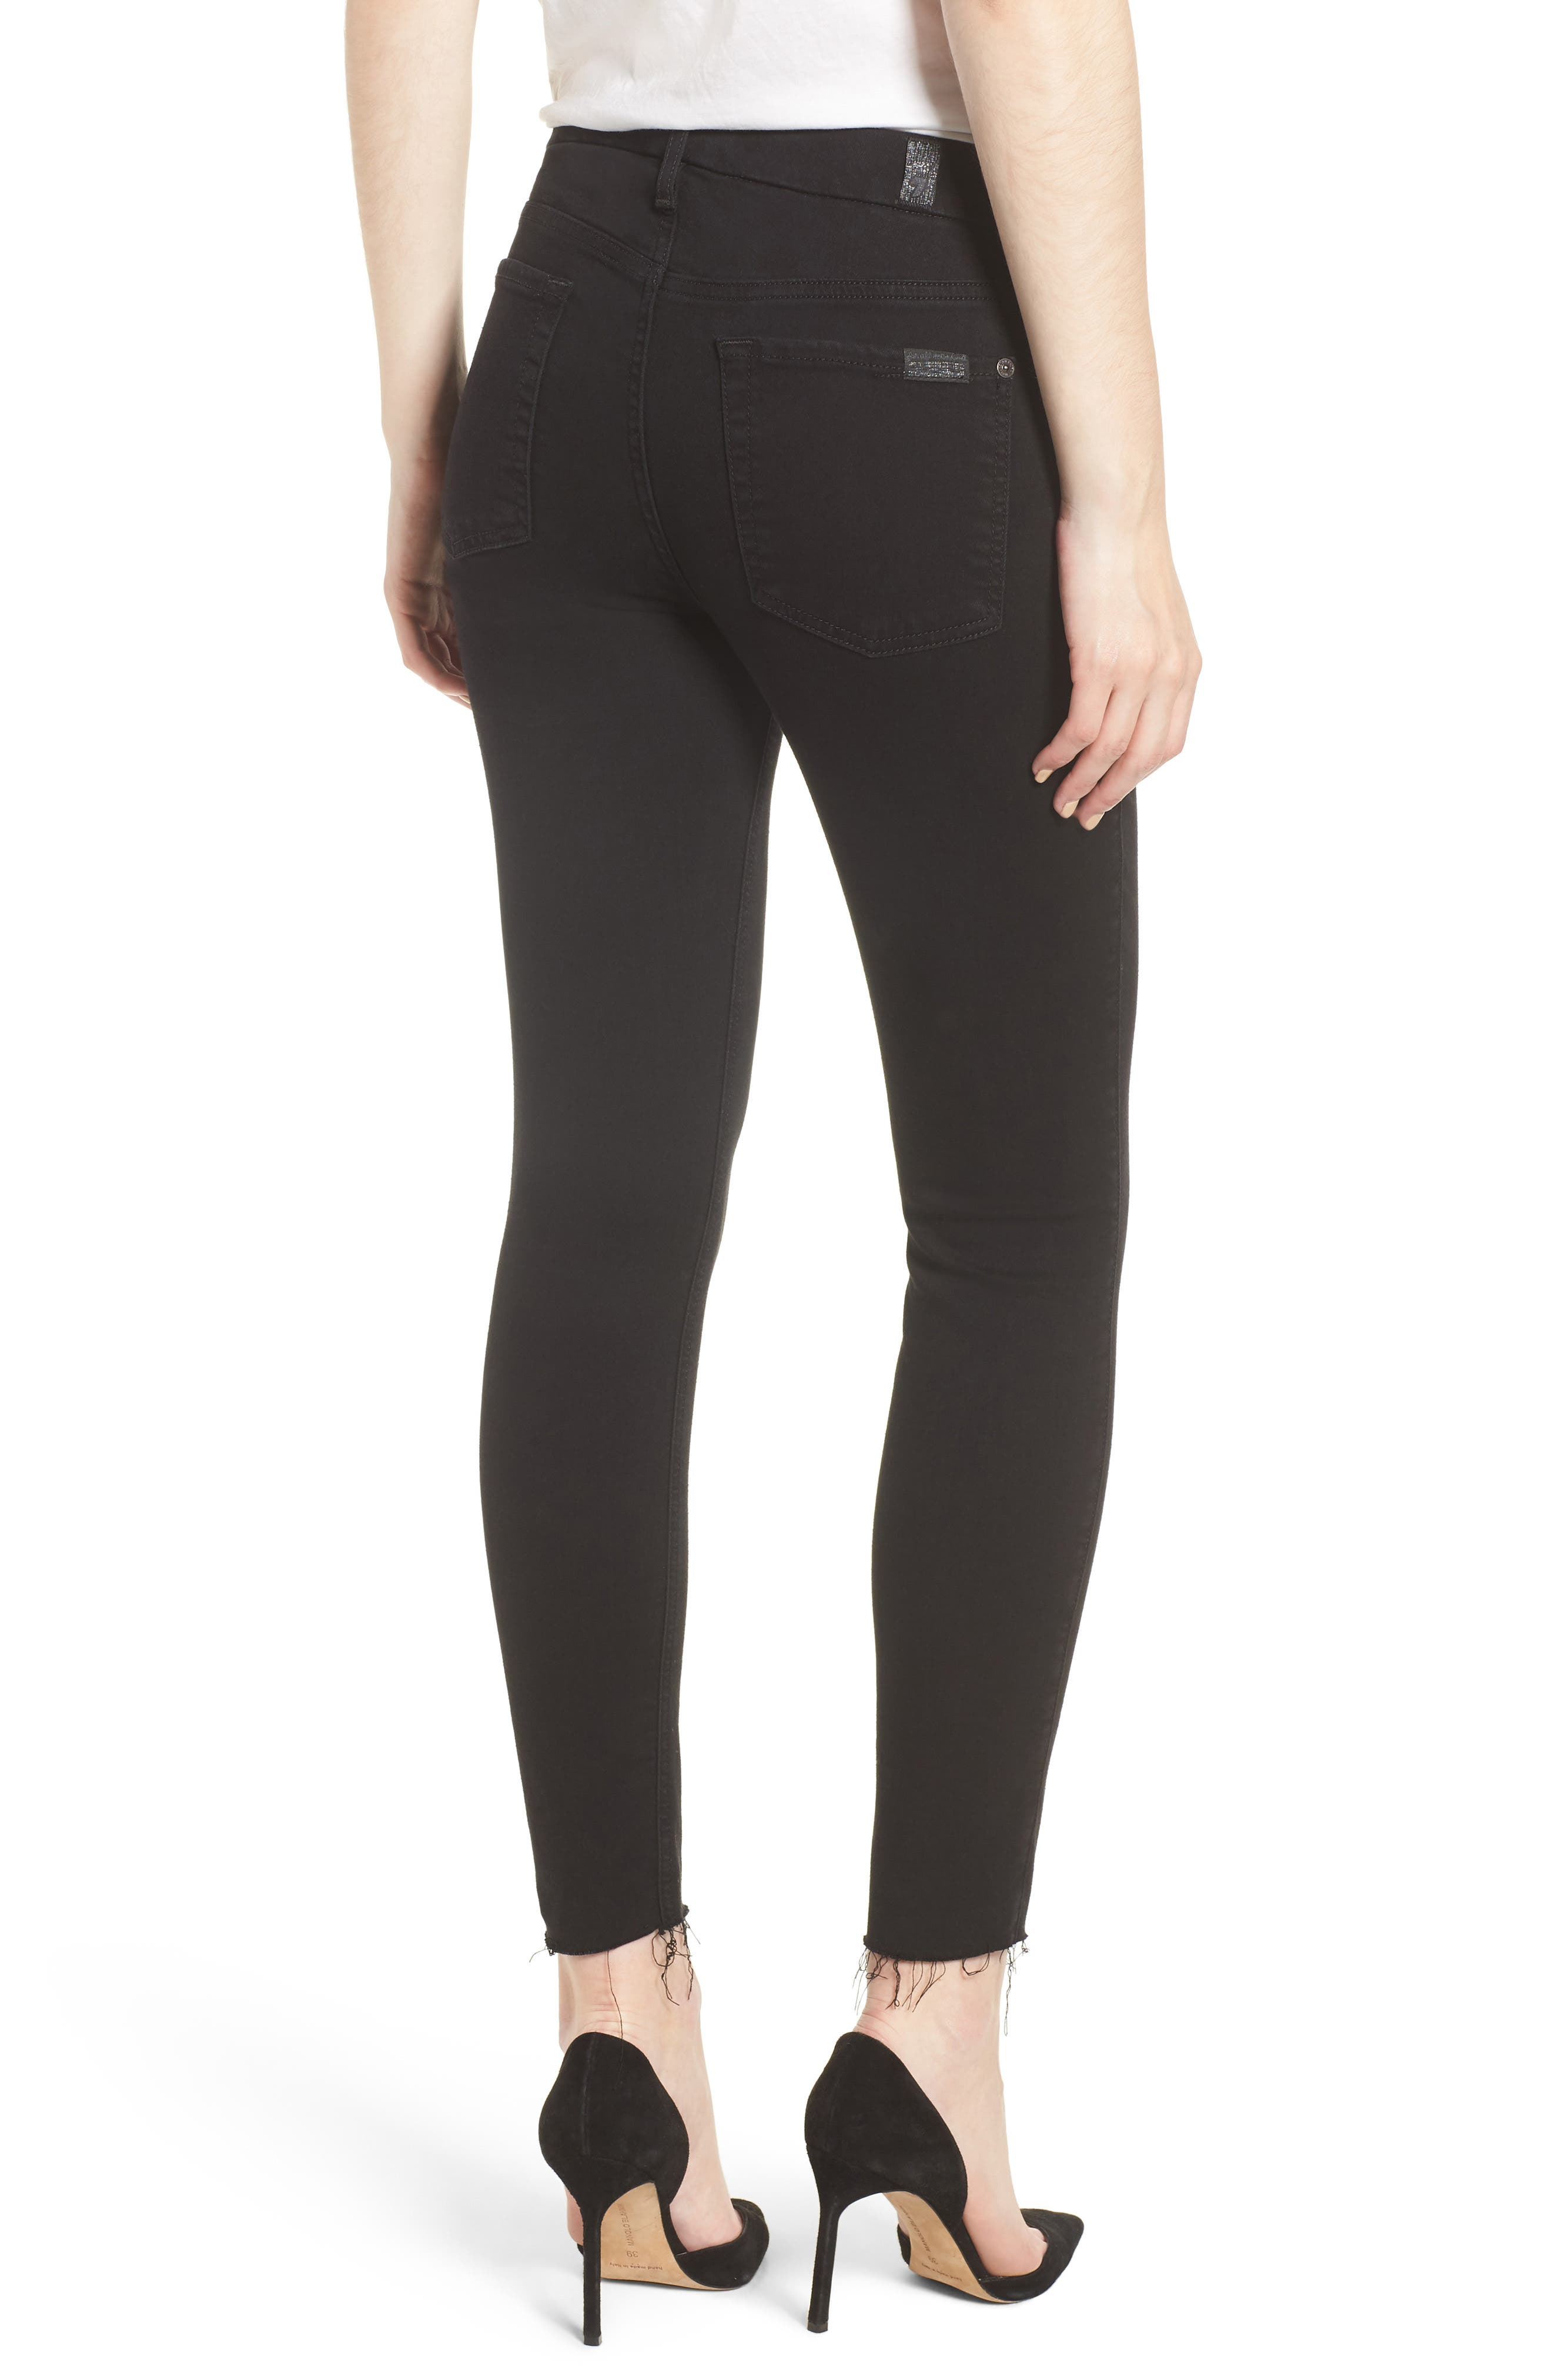 7 FOR ALL MANKIND<SUP>®</SUP>, b(air) Raw Hem Crop Skinny Jeans, Alternate thumbnail 2, color, BAIR BLACK